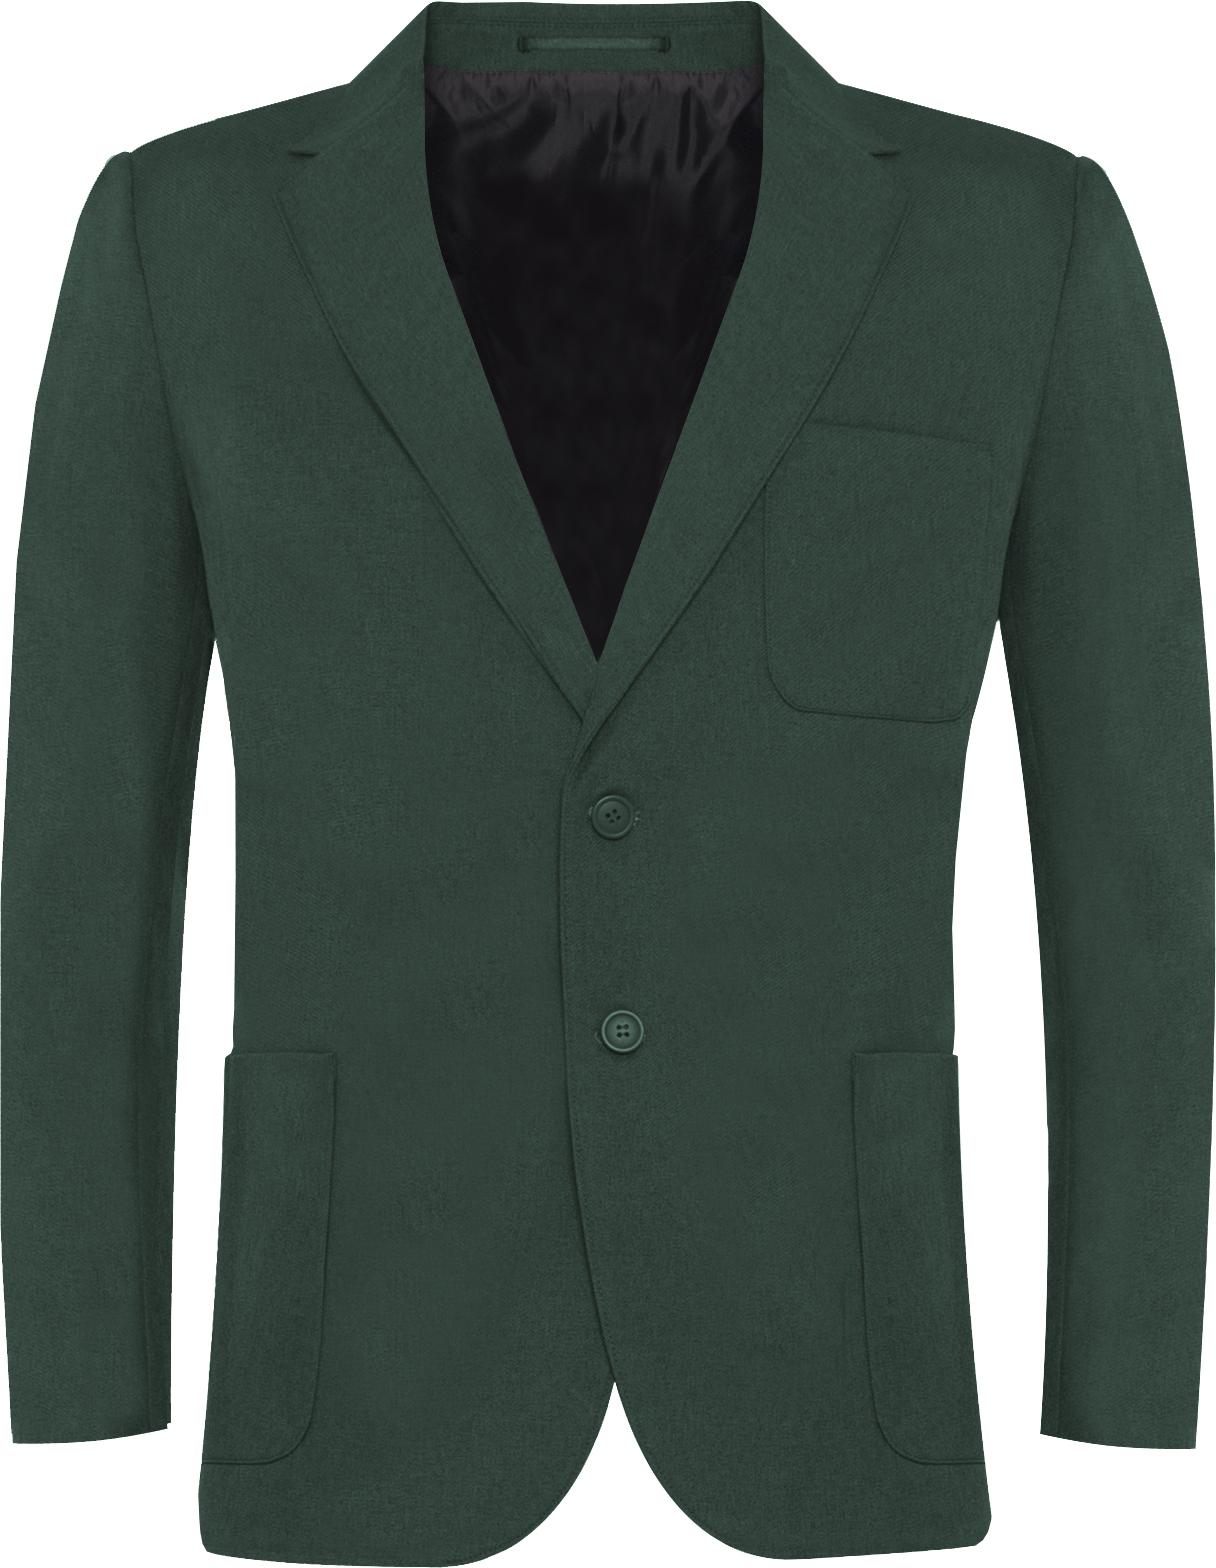 Green Polyester Blazer (Boys)